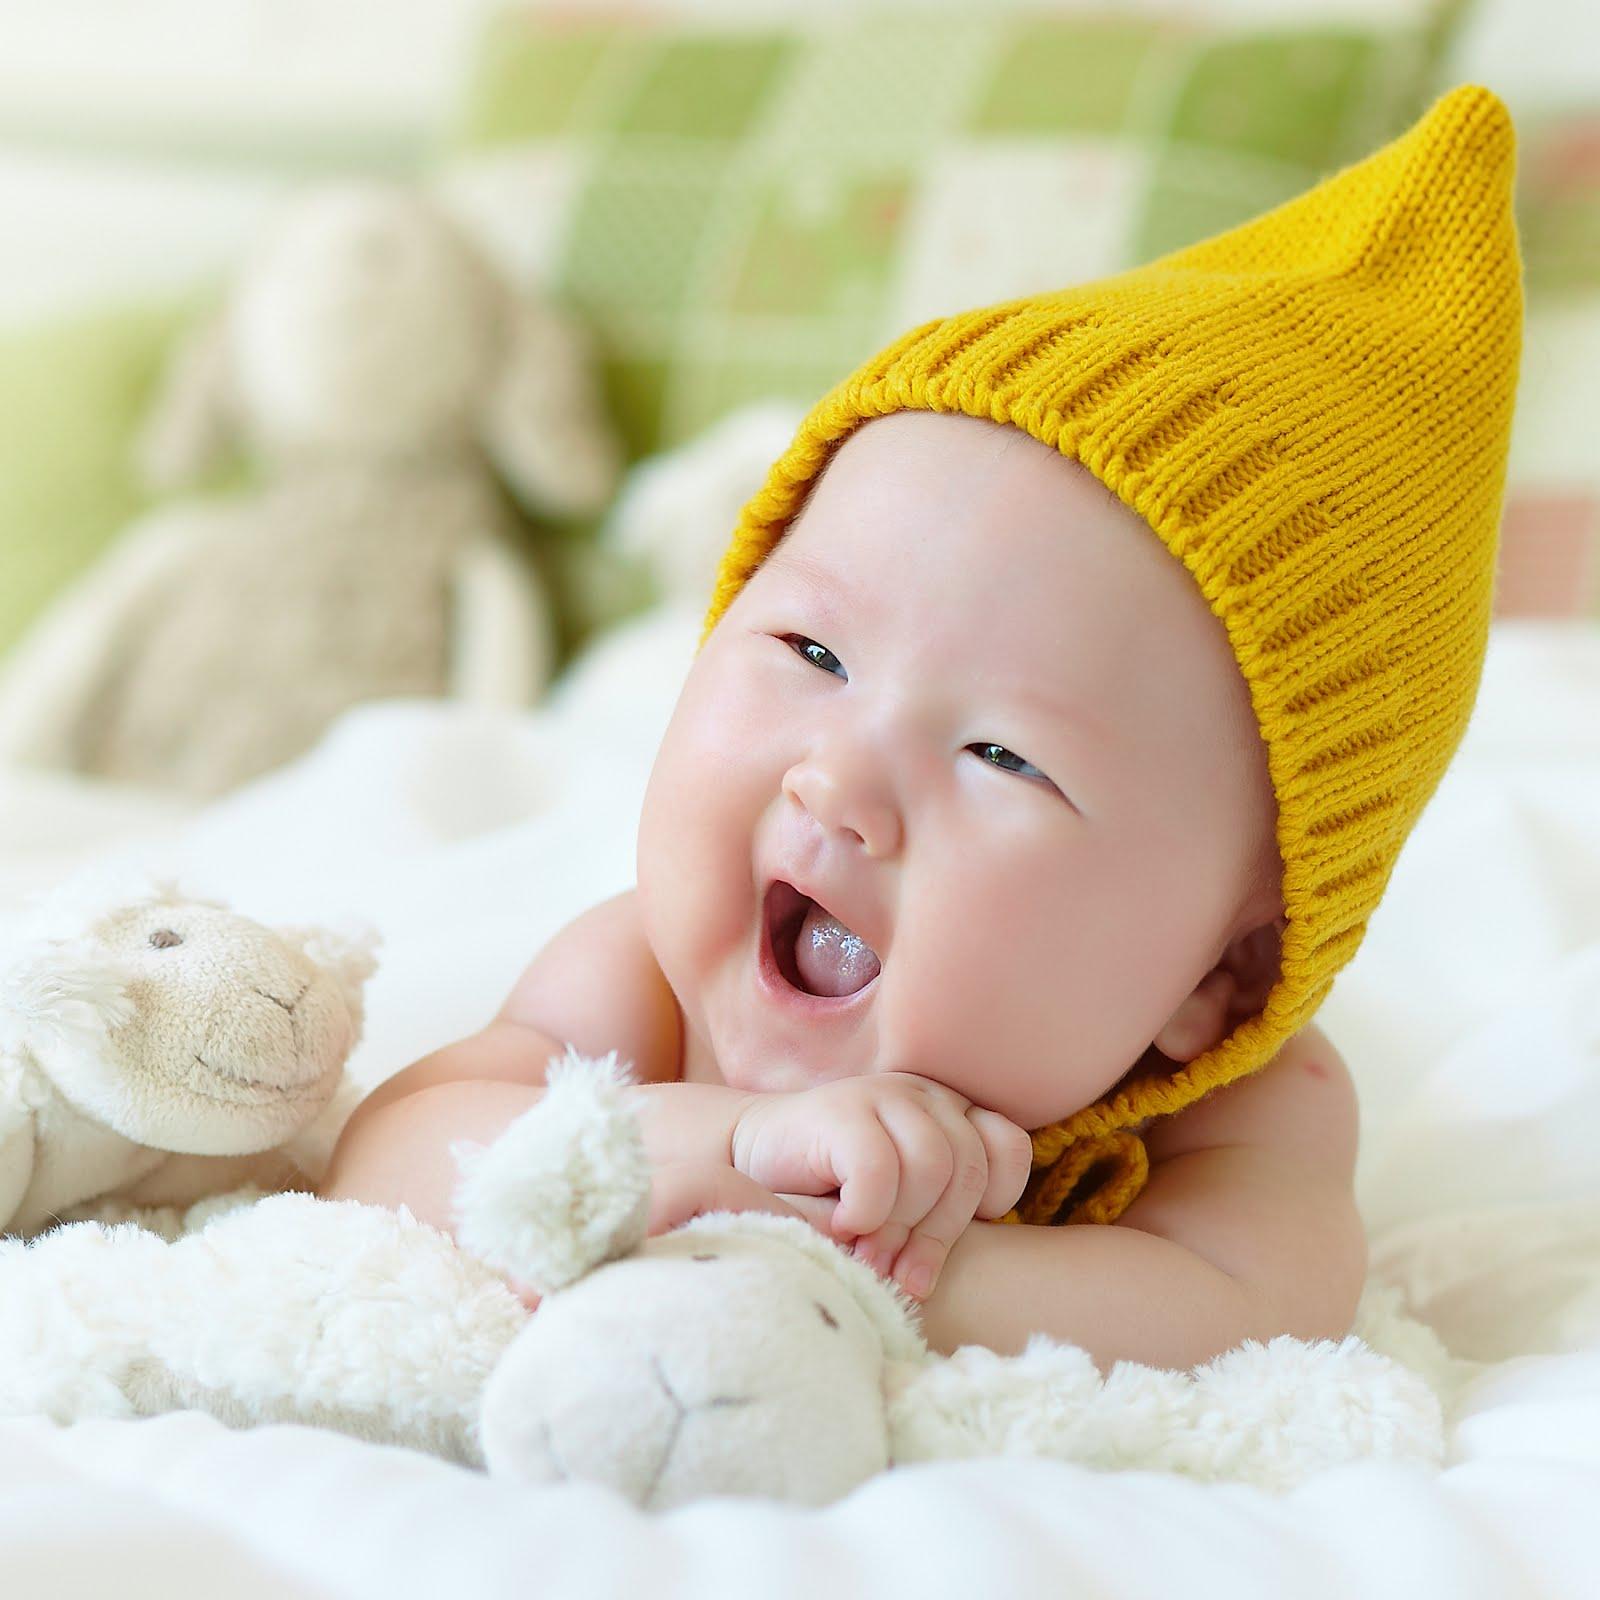 newborn babybabyu: newborn babybabyu